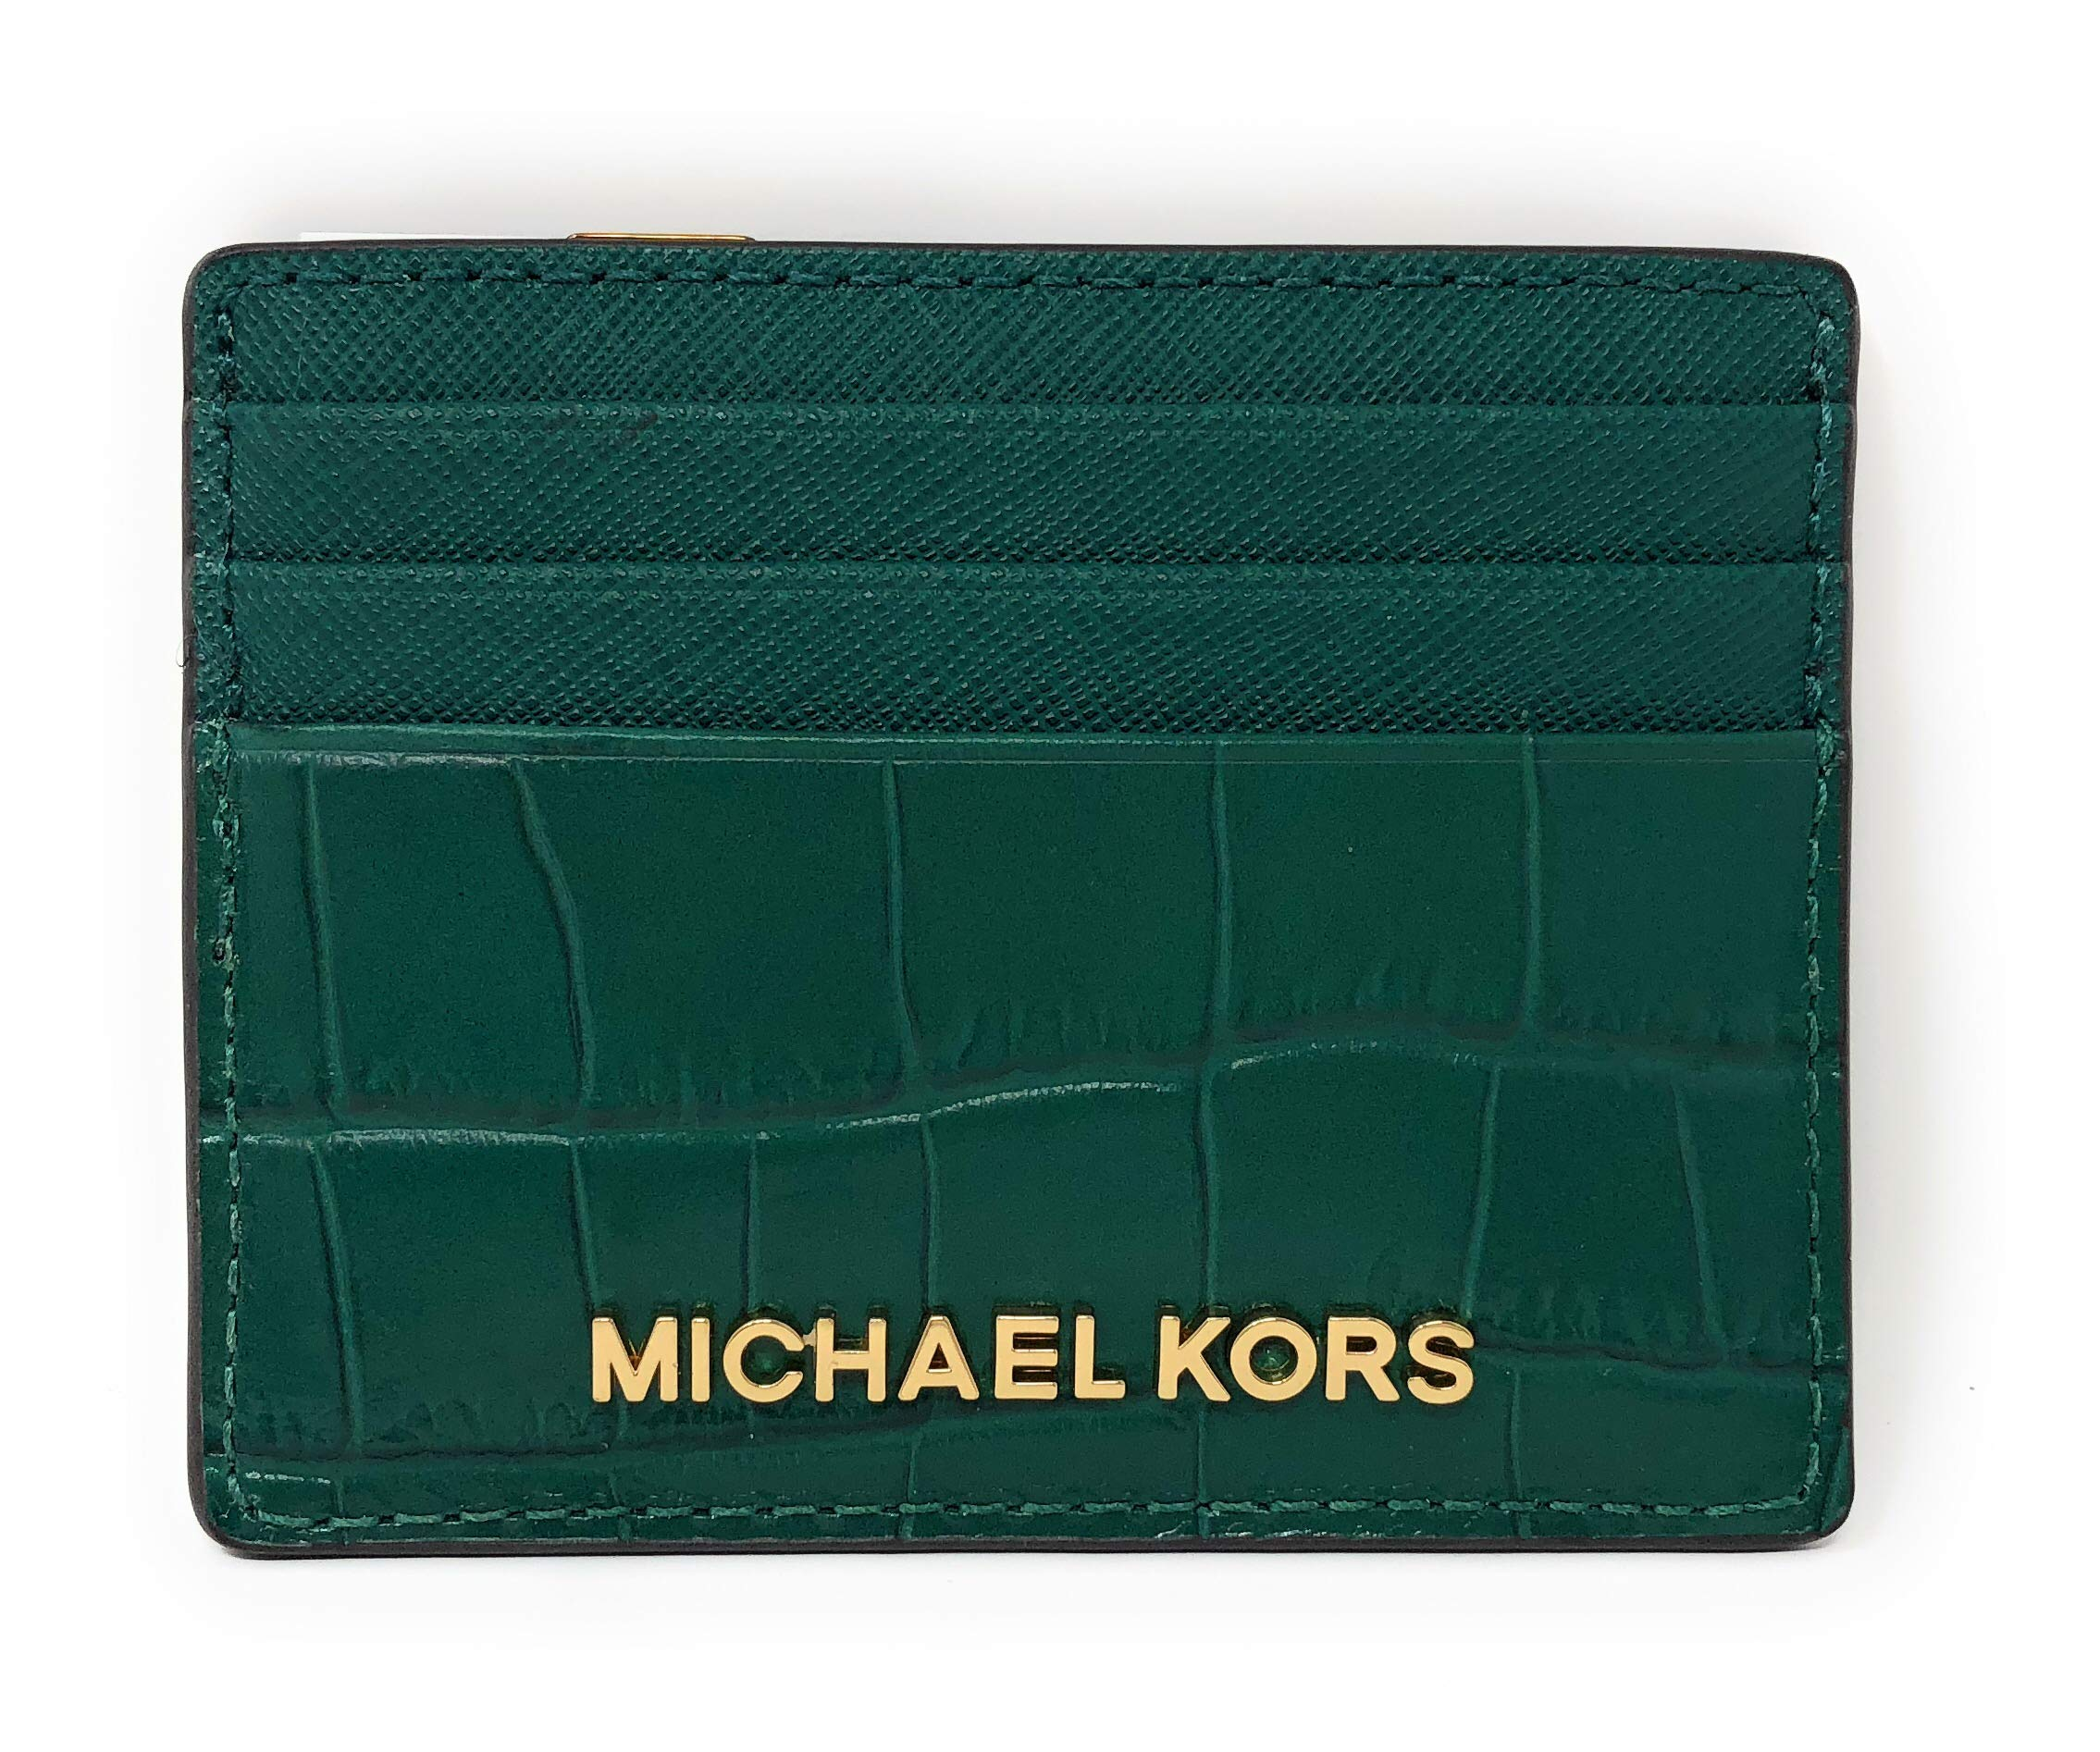 Michael Kors Jet Set Travel Credit Card Holder Case Embossed Leather in Emerald